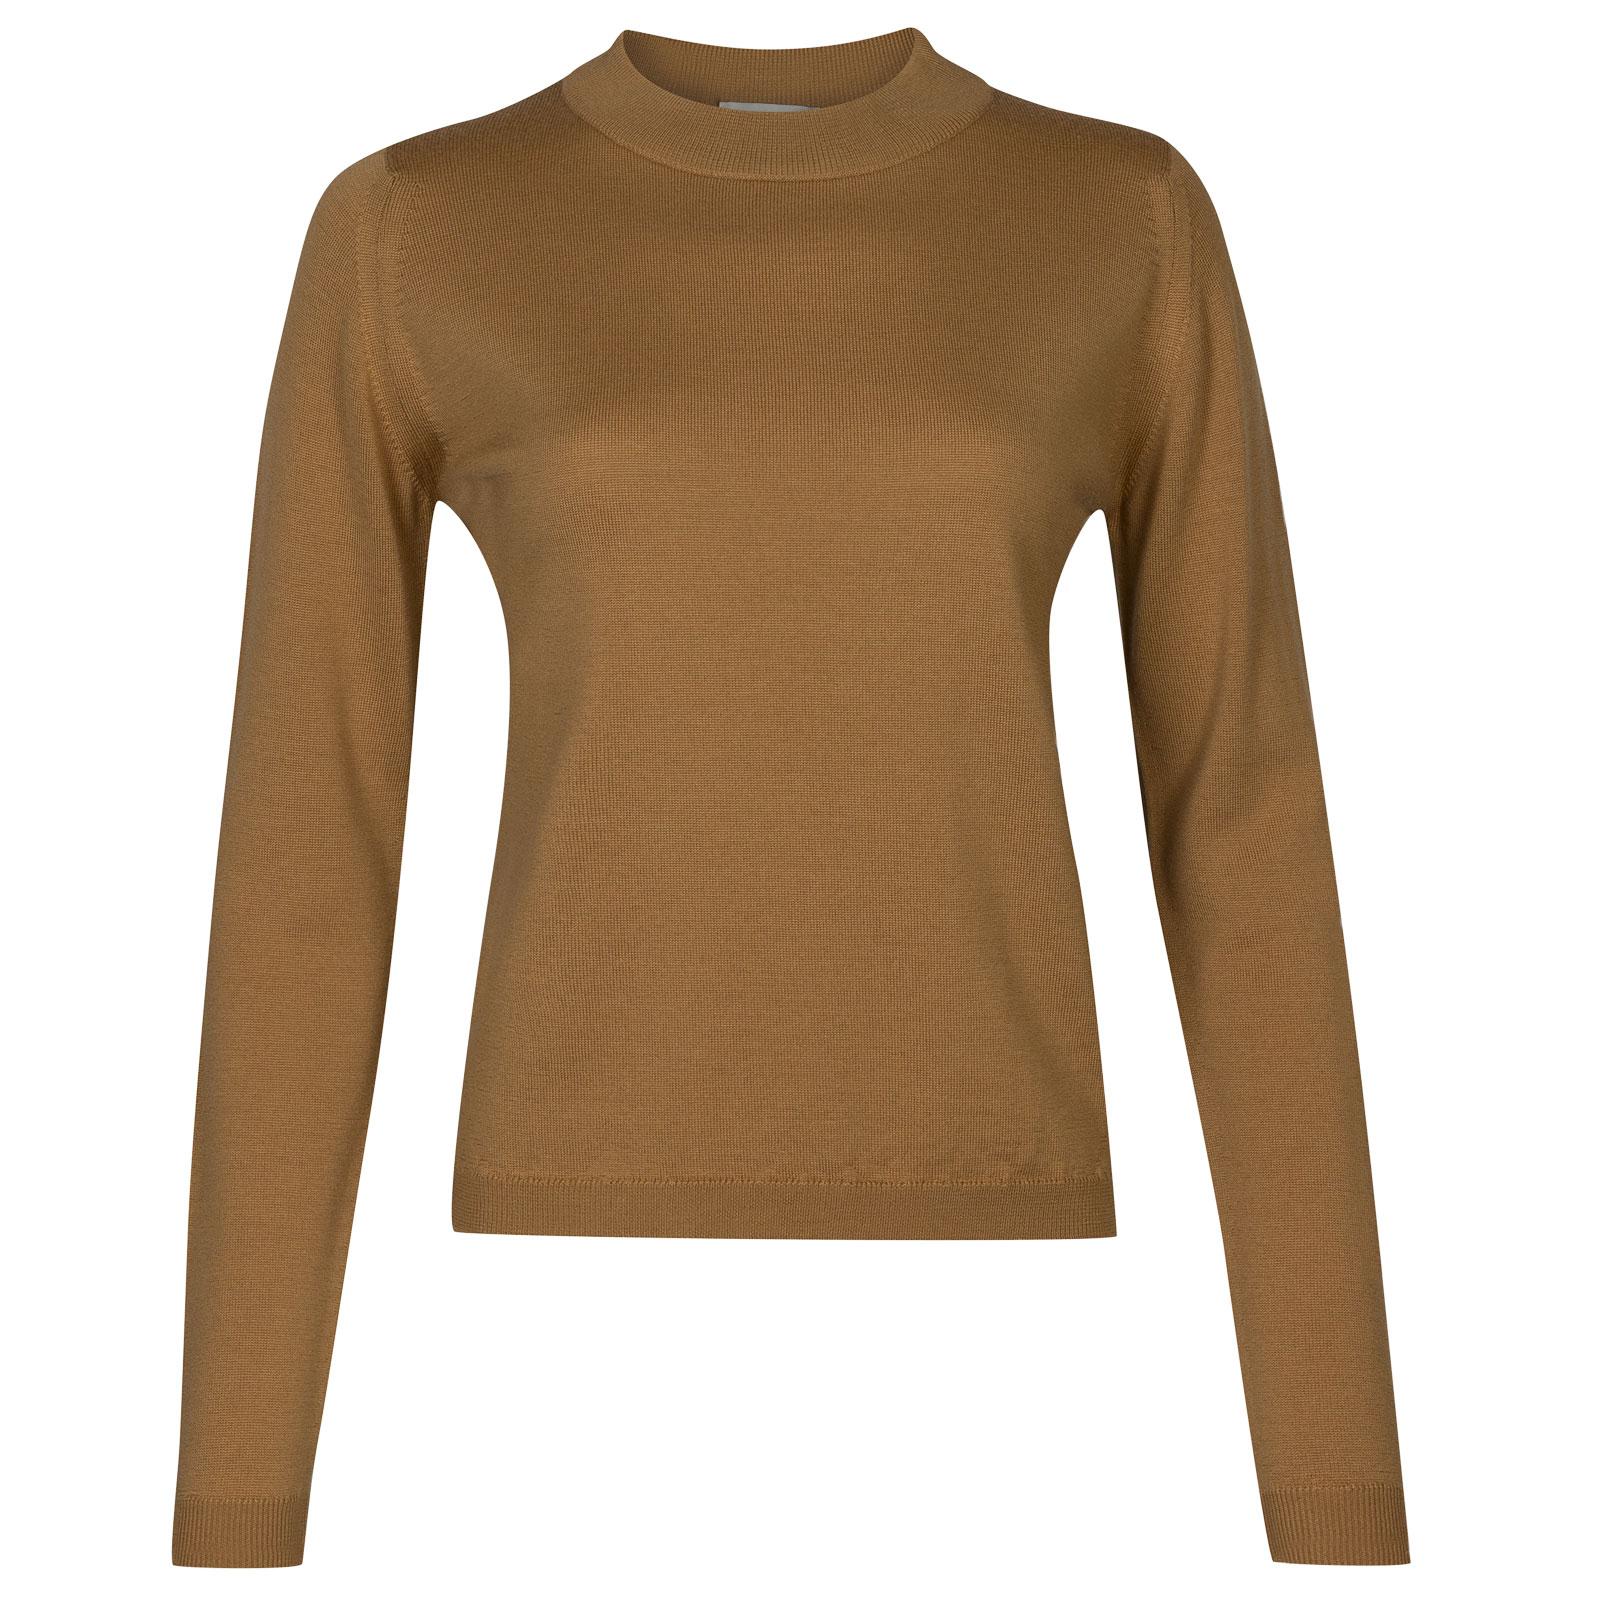 John Smedley renata Merino Wool Sweater in Camel-S